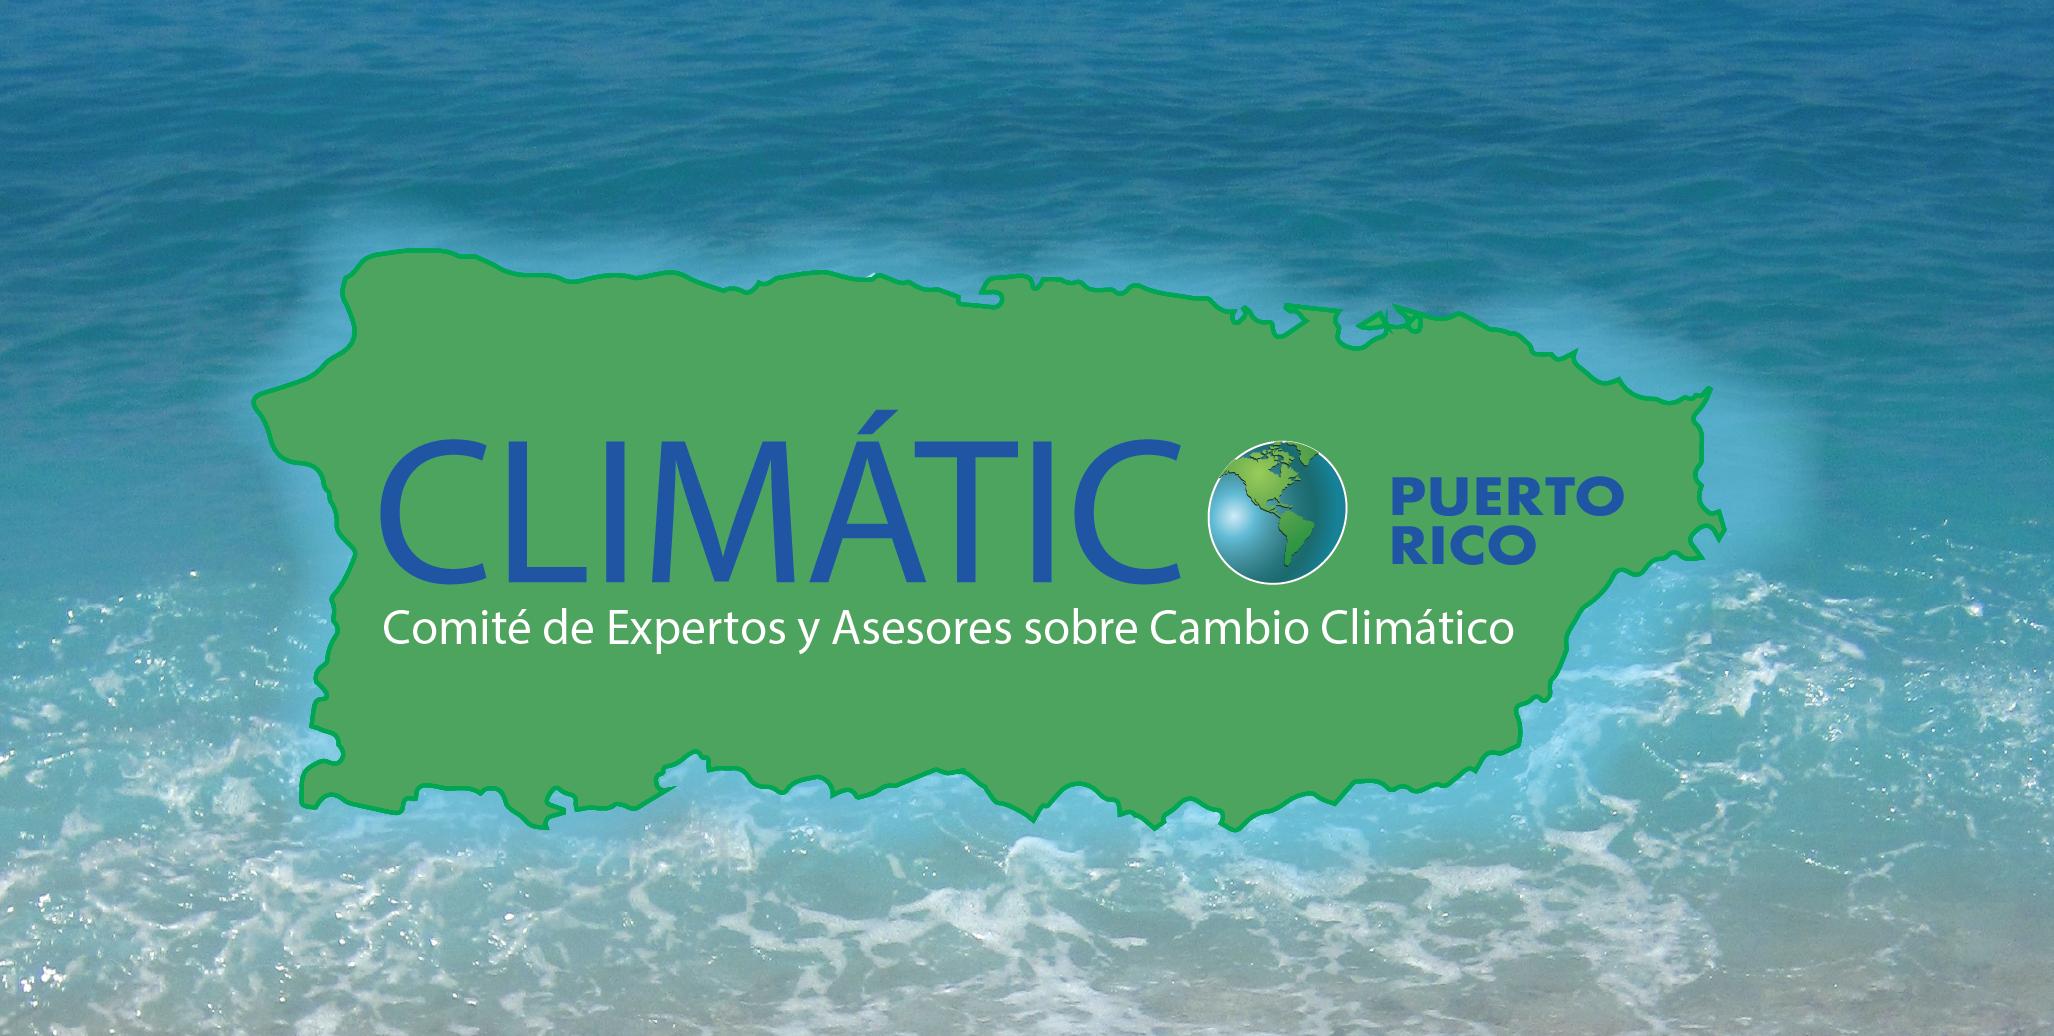 Comité de Expertos y Asesores sobre Cambio Climático